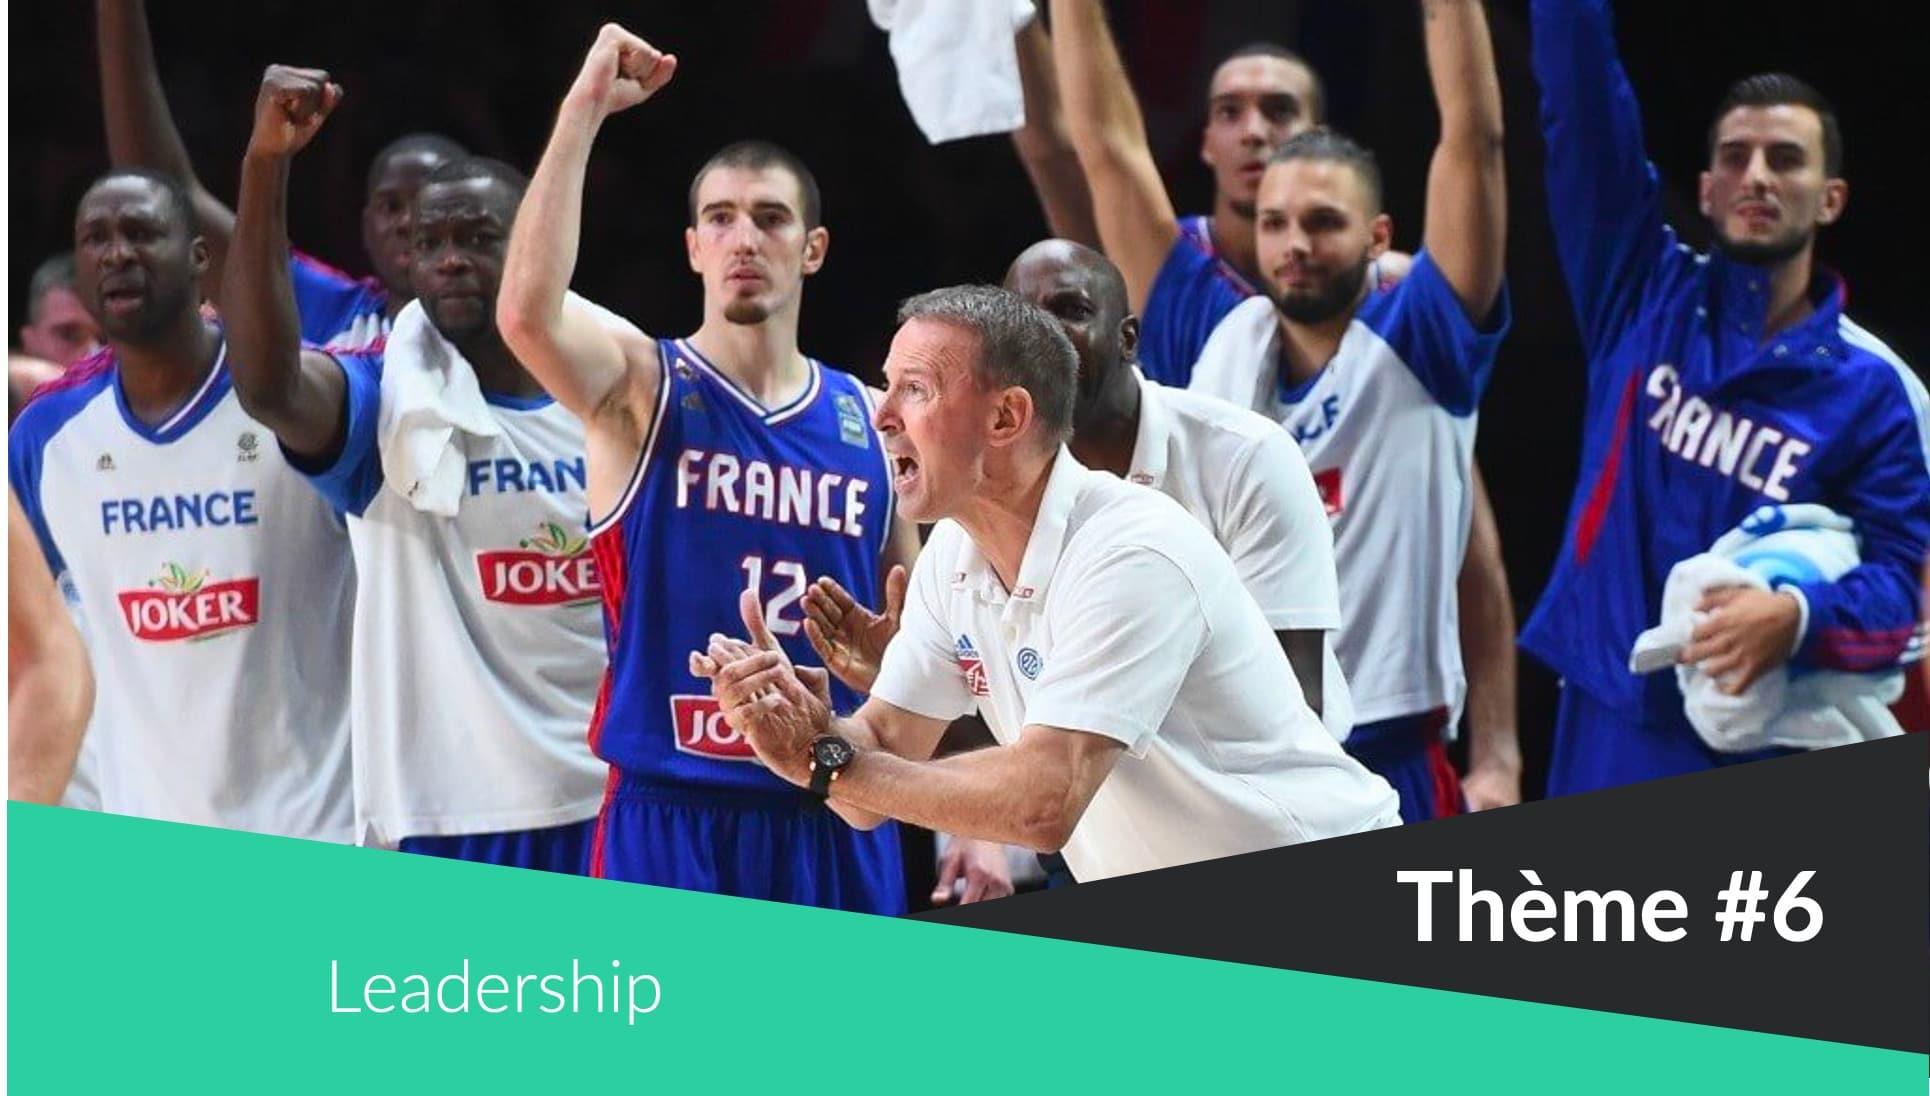 Thème - Leadership